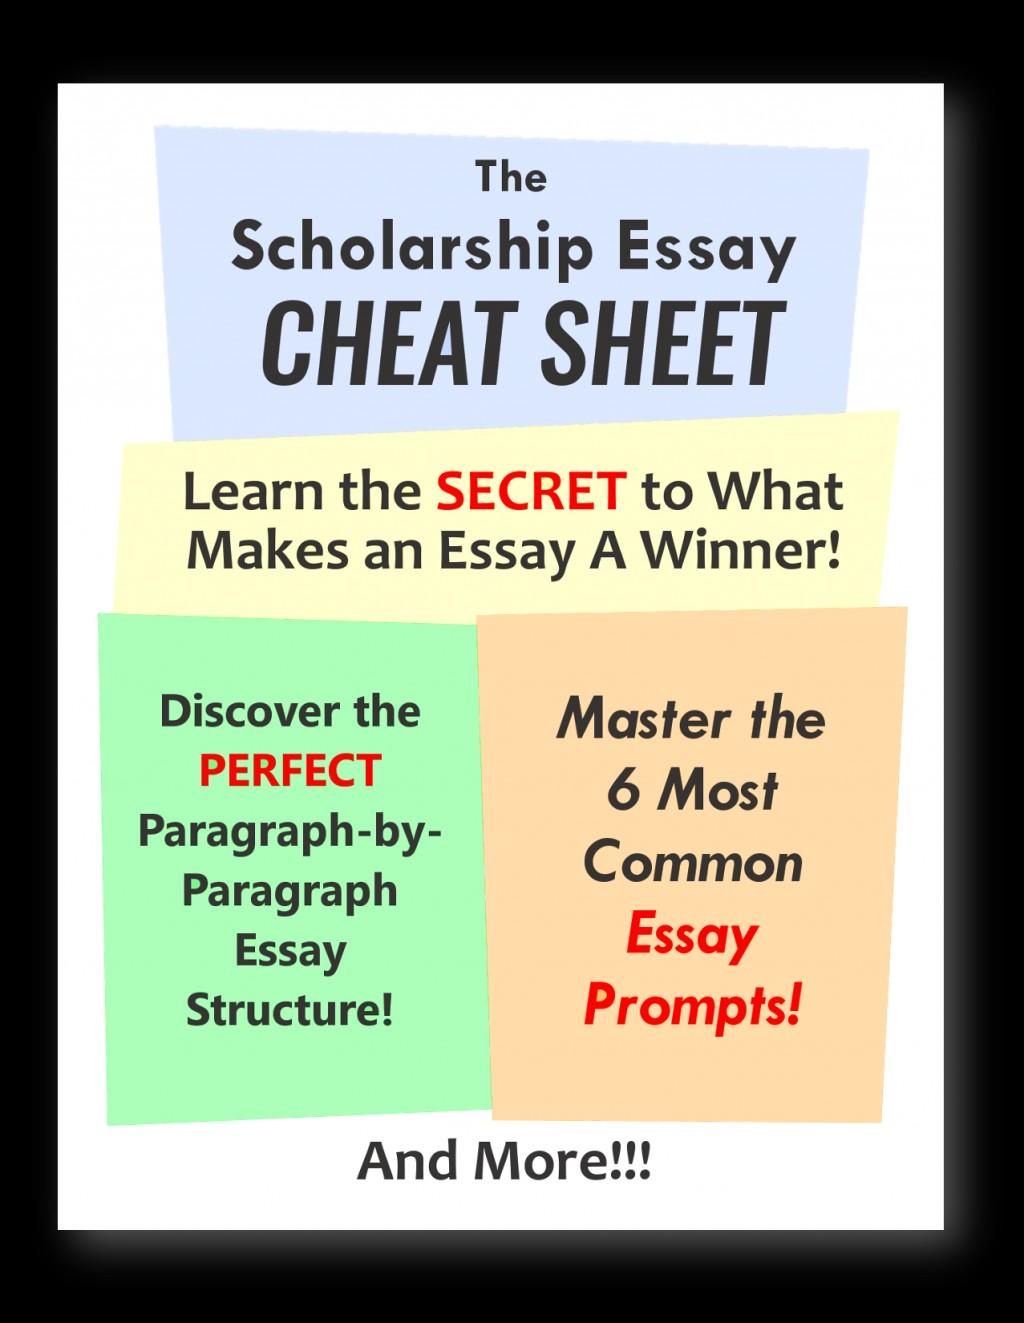 013 Scholarship Essay Prompts Example Magnificent Robertson 2018-19 Vanderbilt Washington And Lee Johnson Large